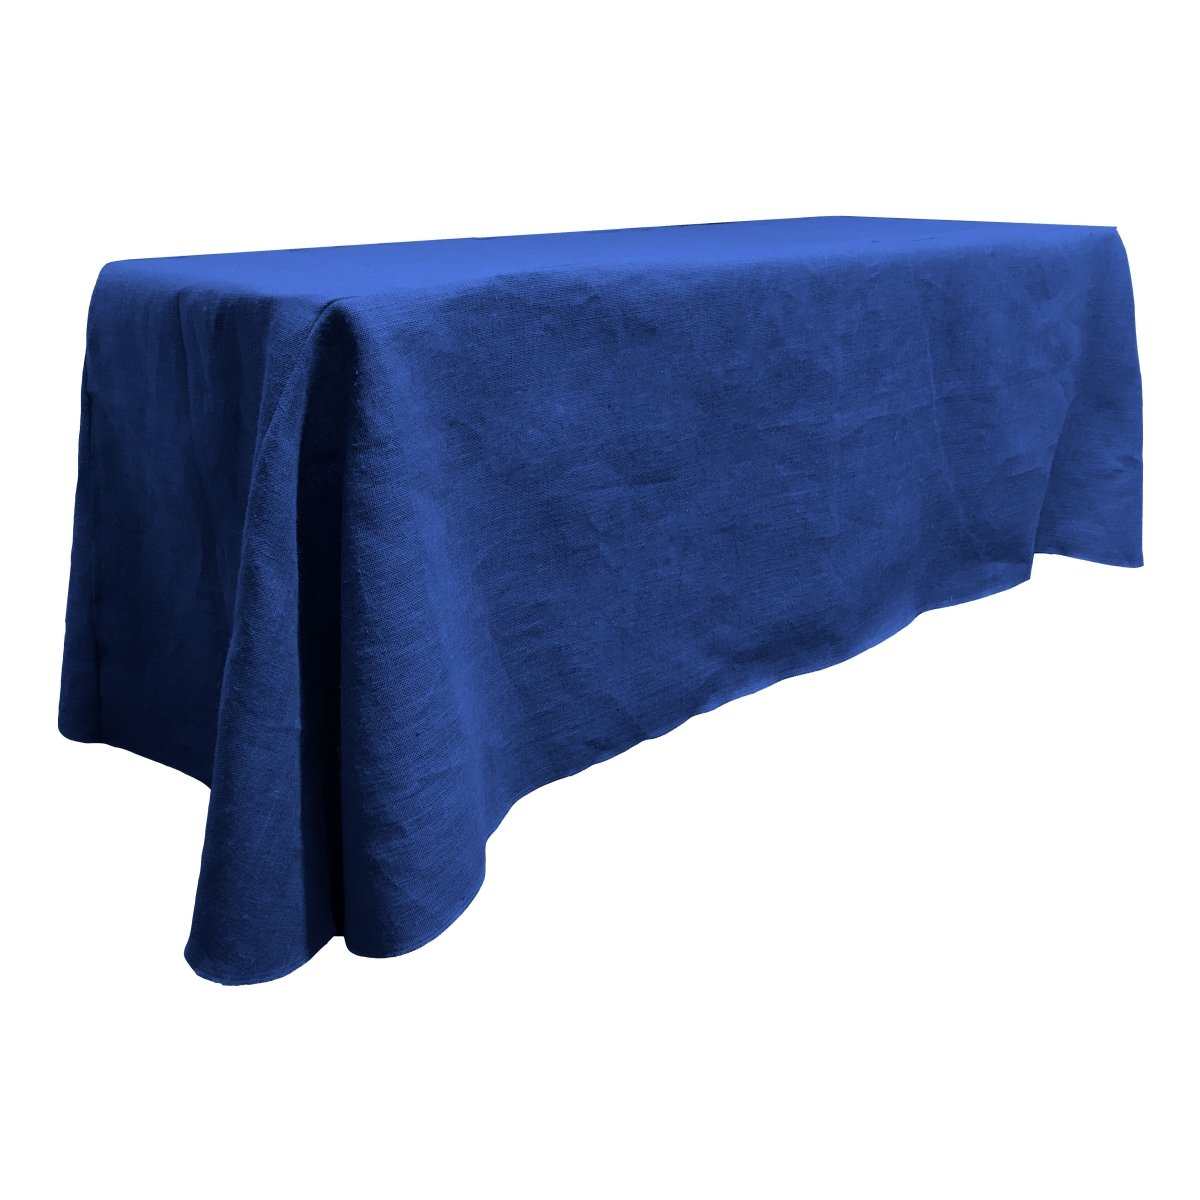 LA Linen Natural Burlap Rectangle Tablecloth 90 by 156-Inch TCburlap90X156Natural